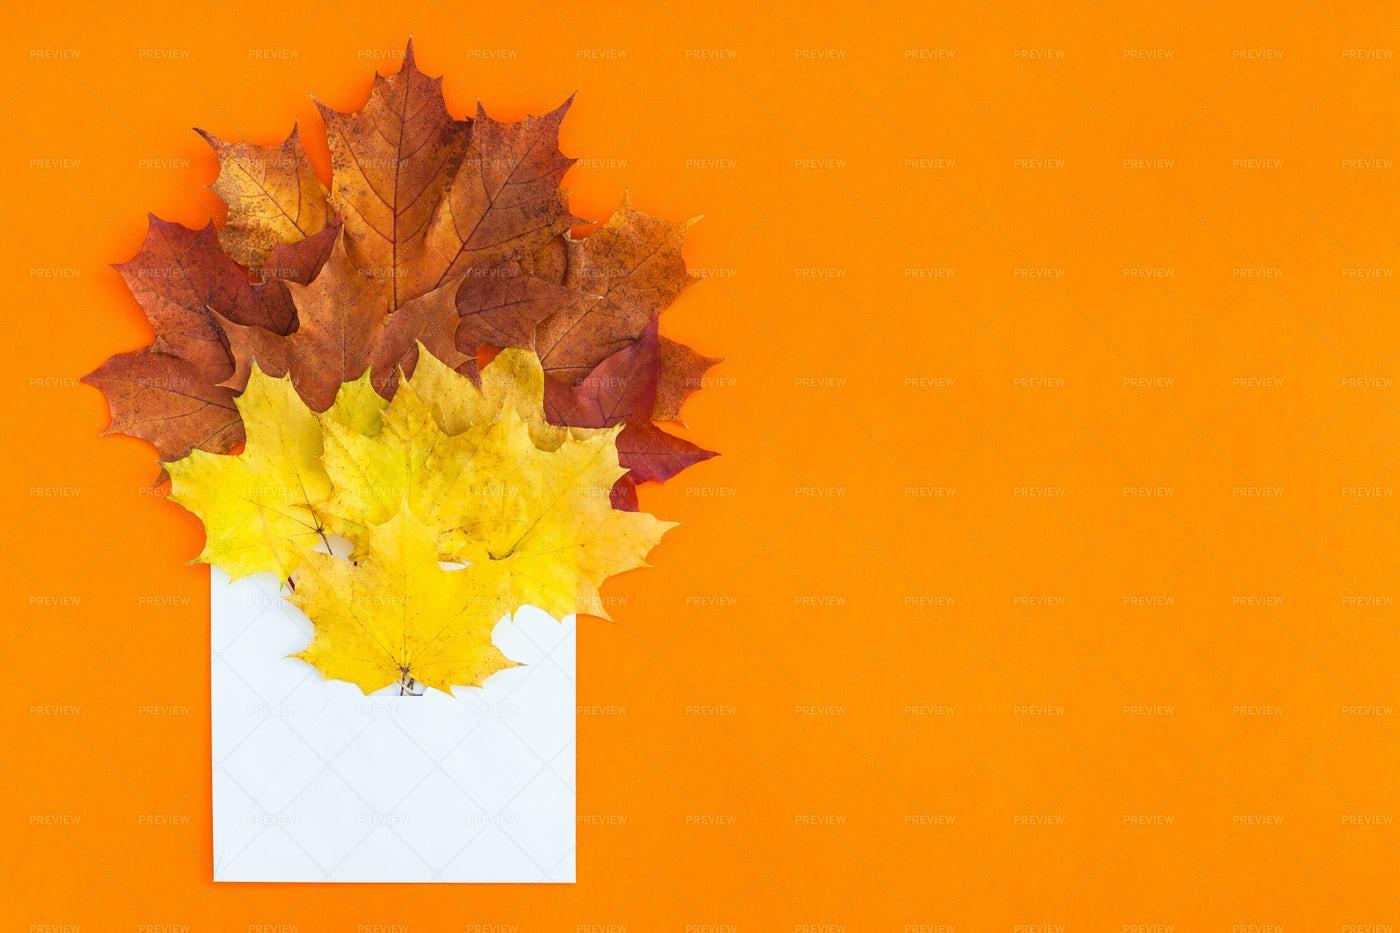 Autumn Leaves In Envelope: Stock Photos